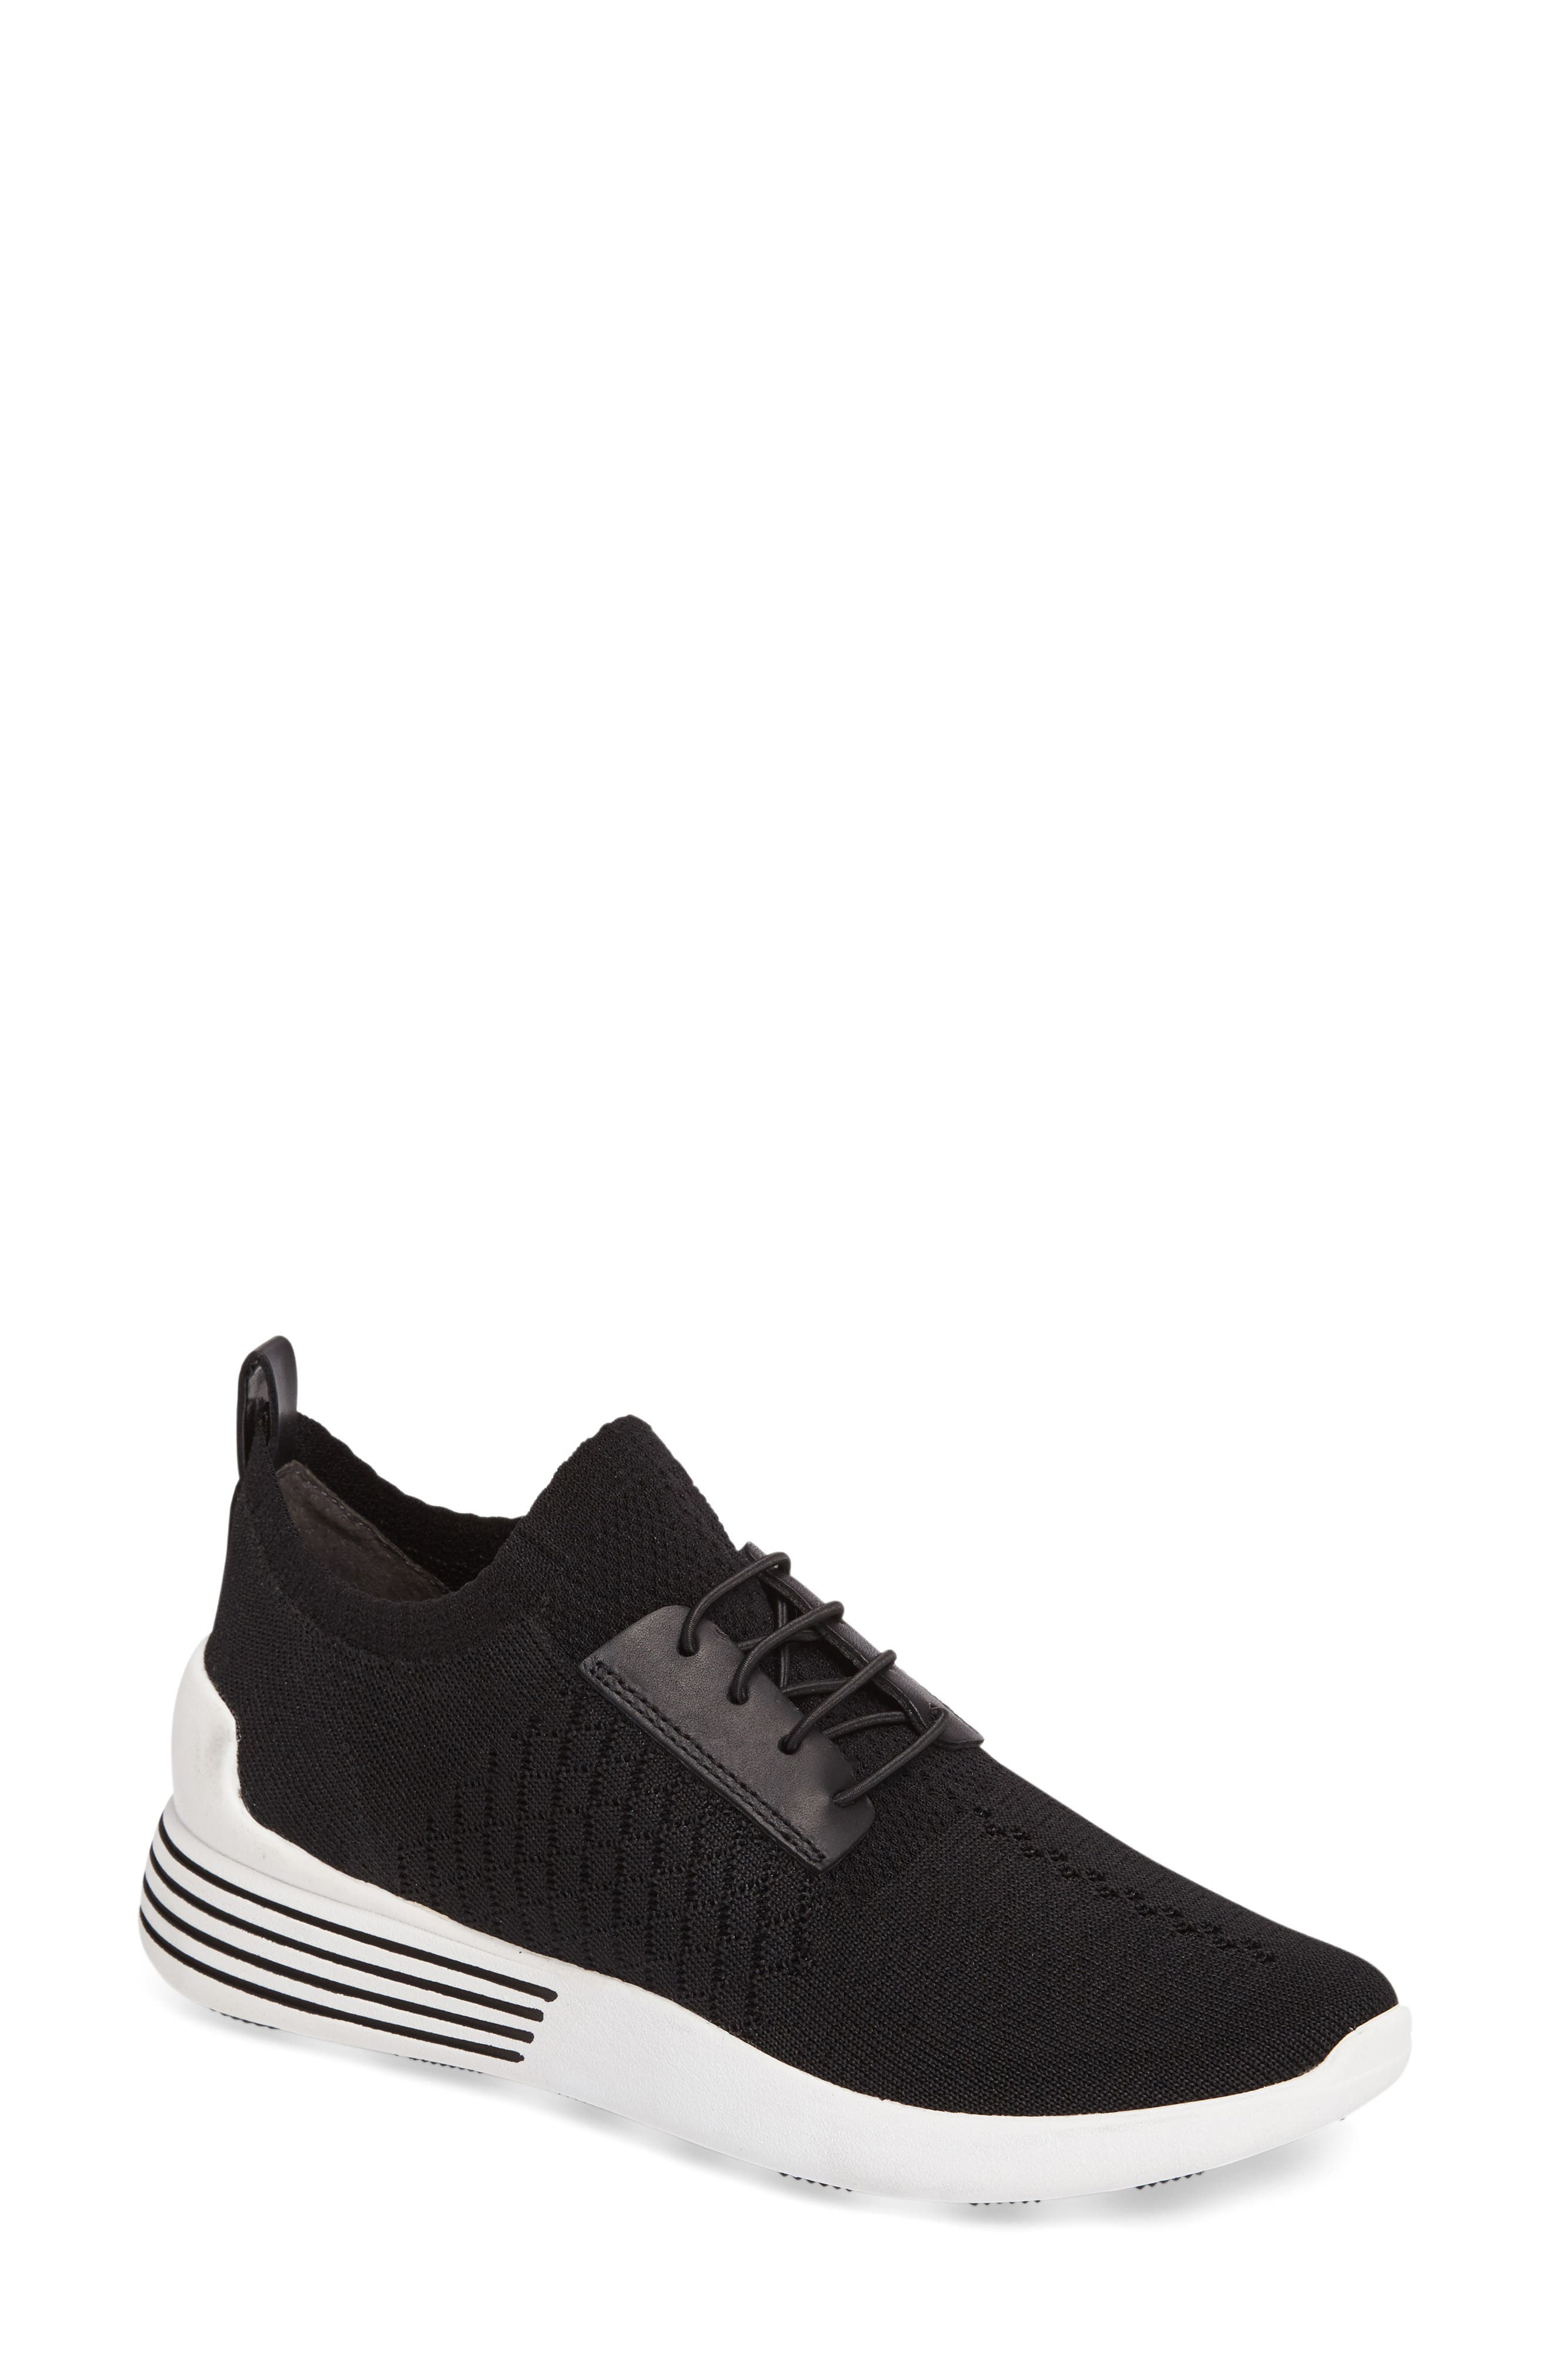 Alternate Image 1 Selected - KENDALL + KYLIE Brandy Woven Sneaker (Women)